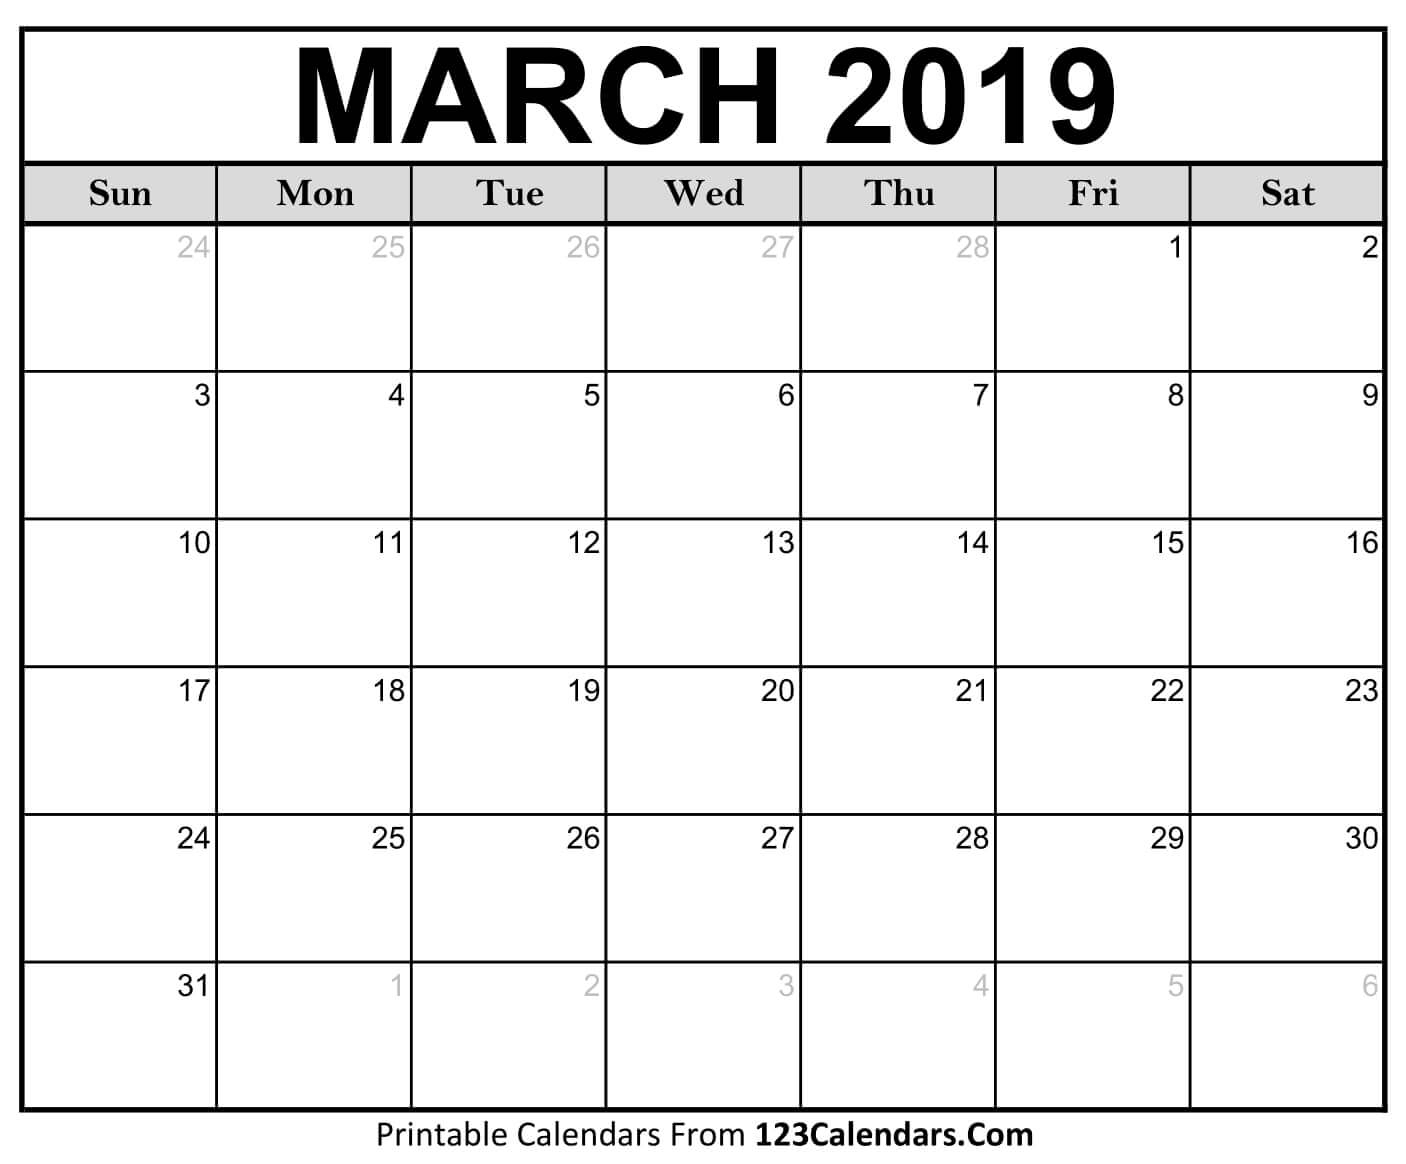 Printable March 2019 Calendar Pdf, Word, Excel Templates